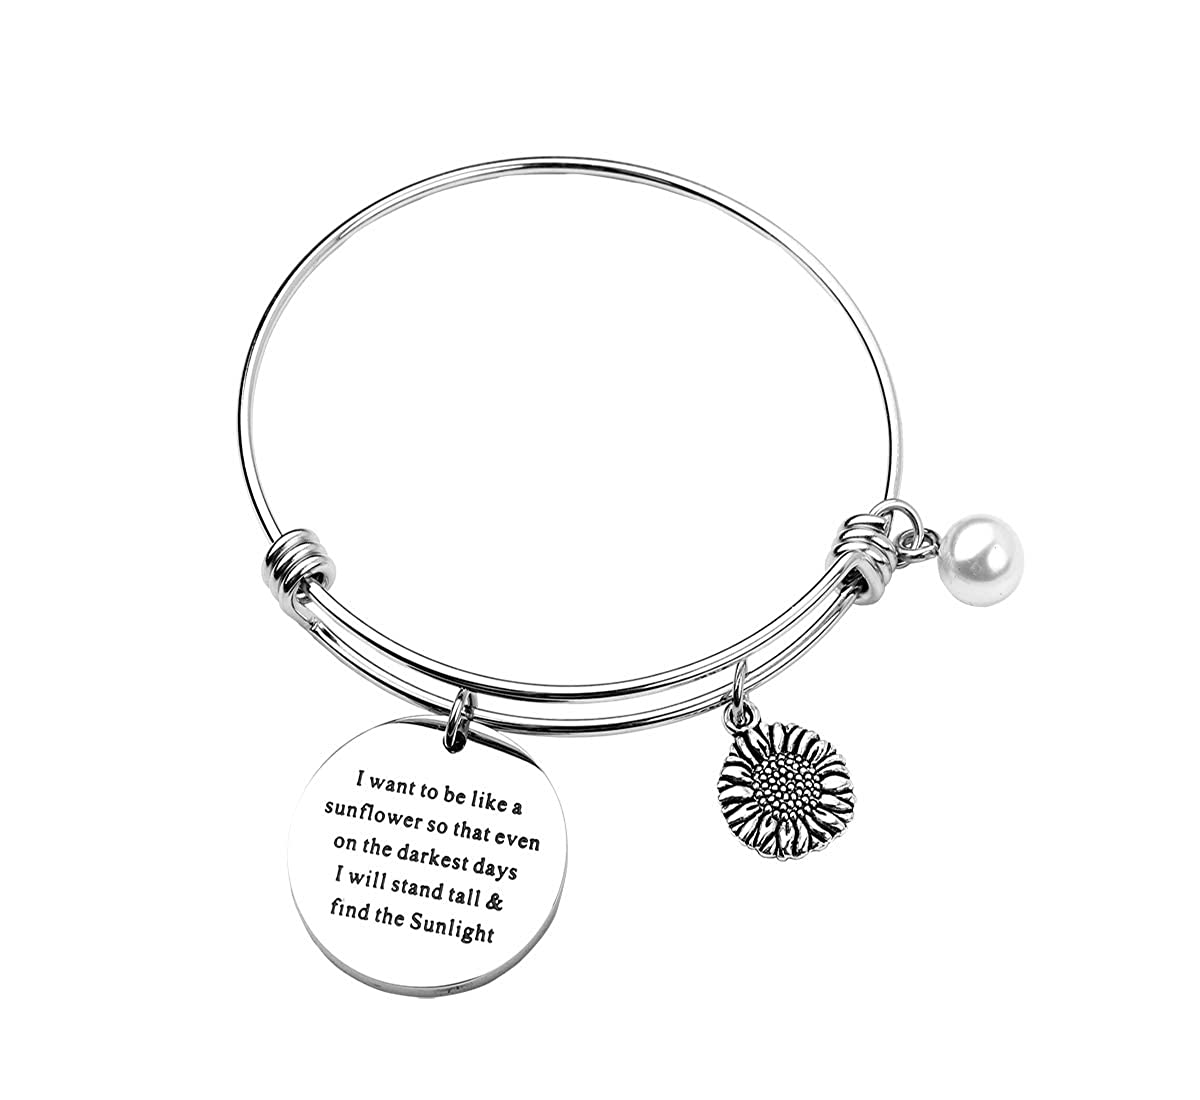 RUNXINTD Sunflower Charm Bracelet Sunflower Jewelry I Want to be Like a Sunflower Floral Bangle Bracelet Inspirational Gift for Womens, Girls Girls (Keychain) 18RX11BR01